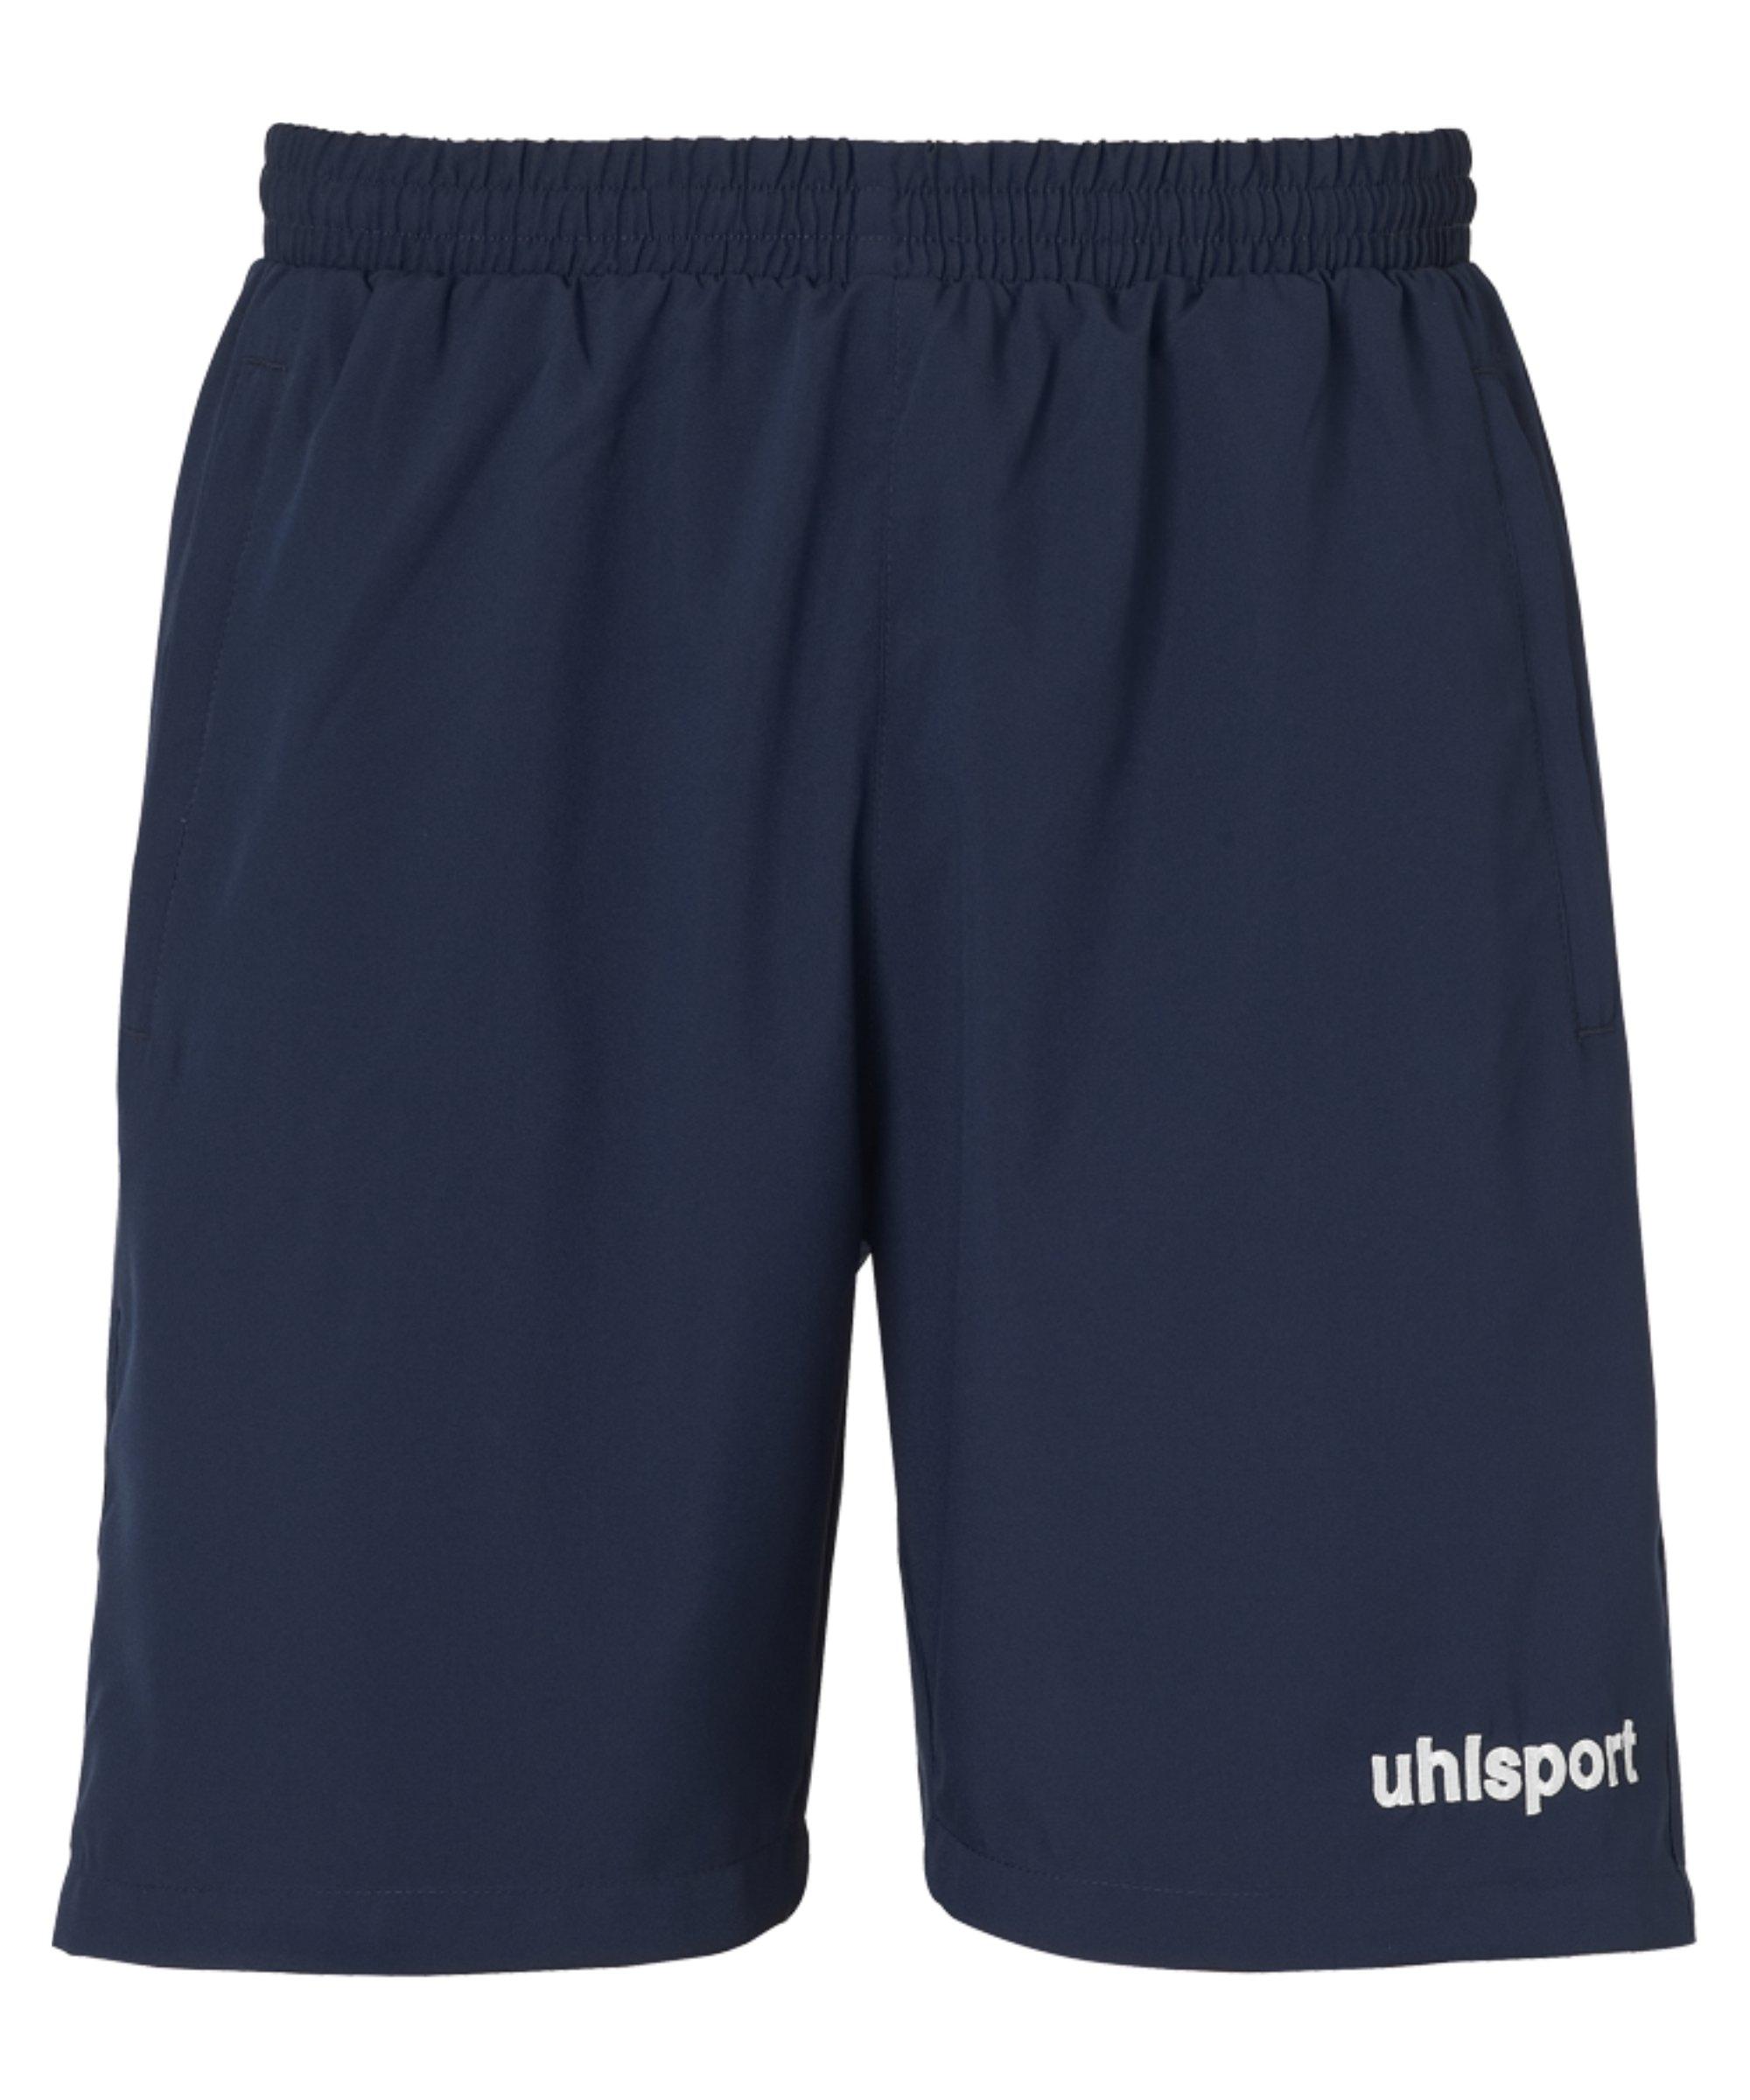 Uhlsport Essential Webshorts Kids Blau F02 - blau